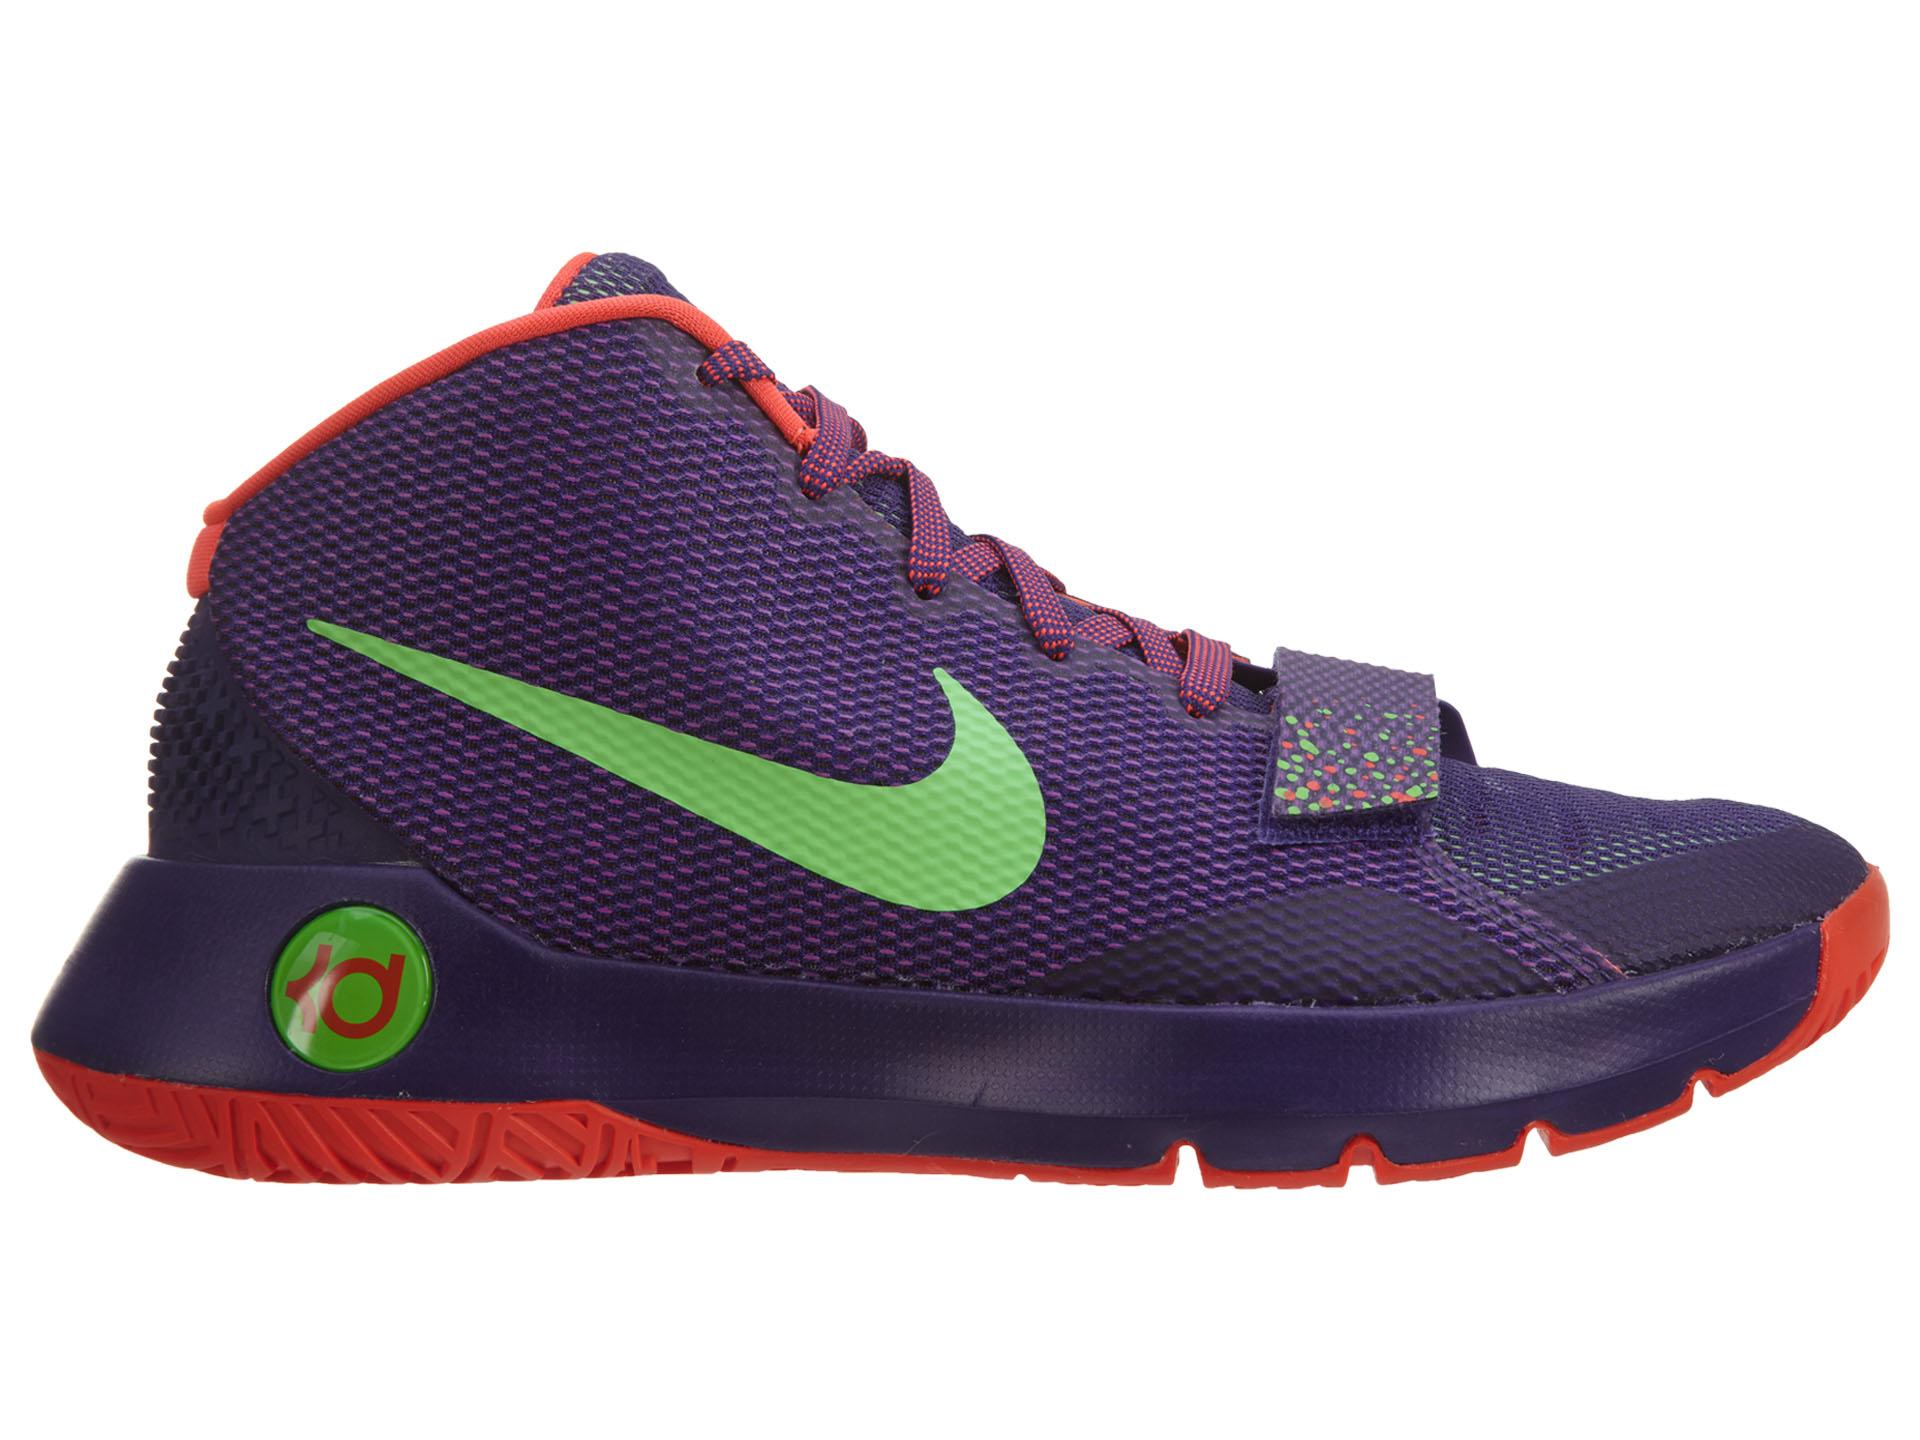 Nike Kd Trey 5 Iii Court Purple / Green